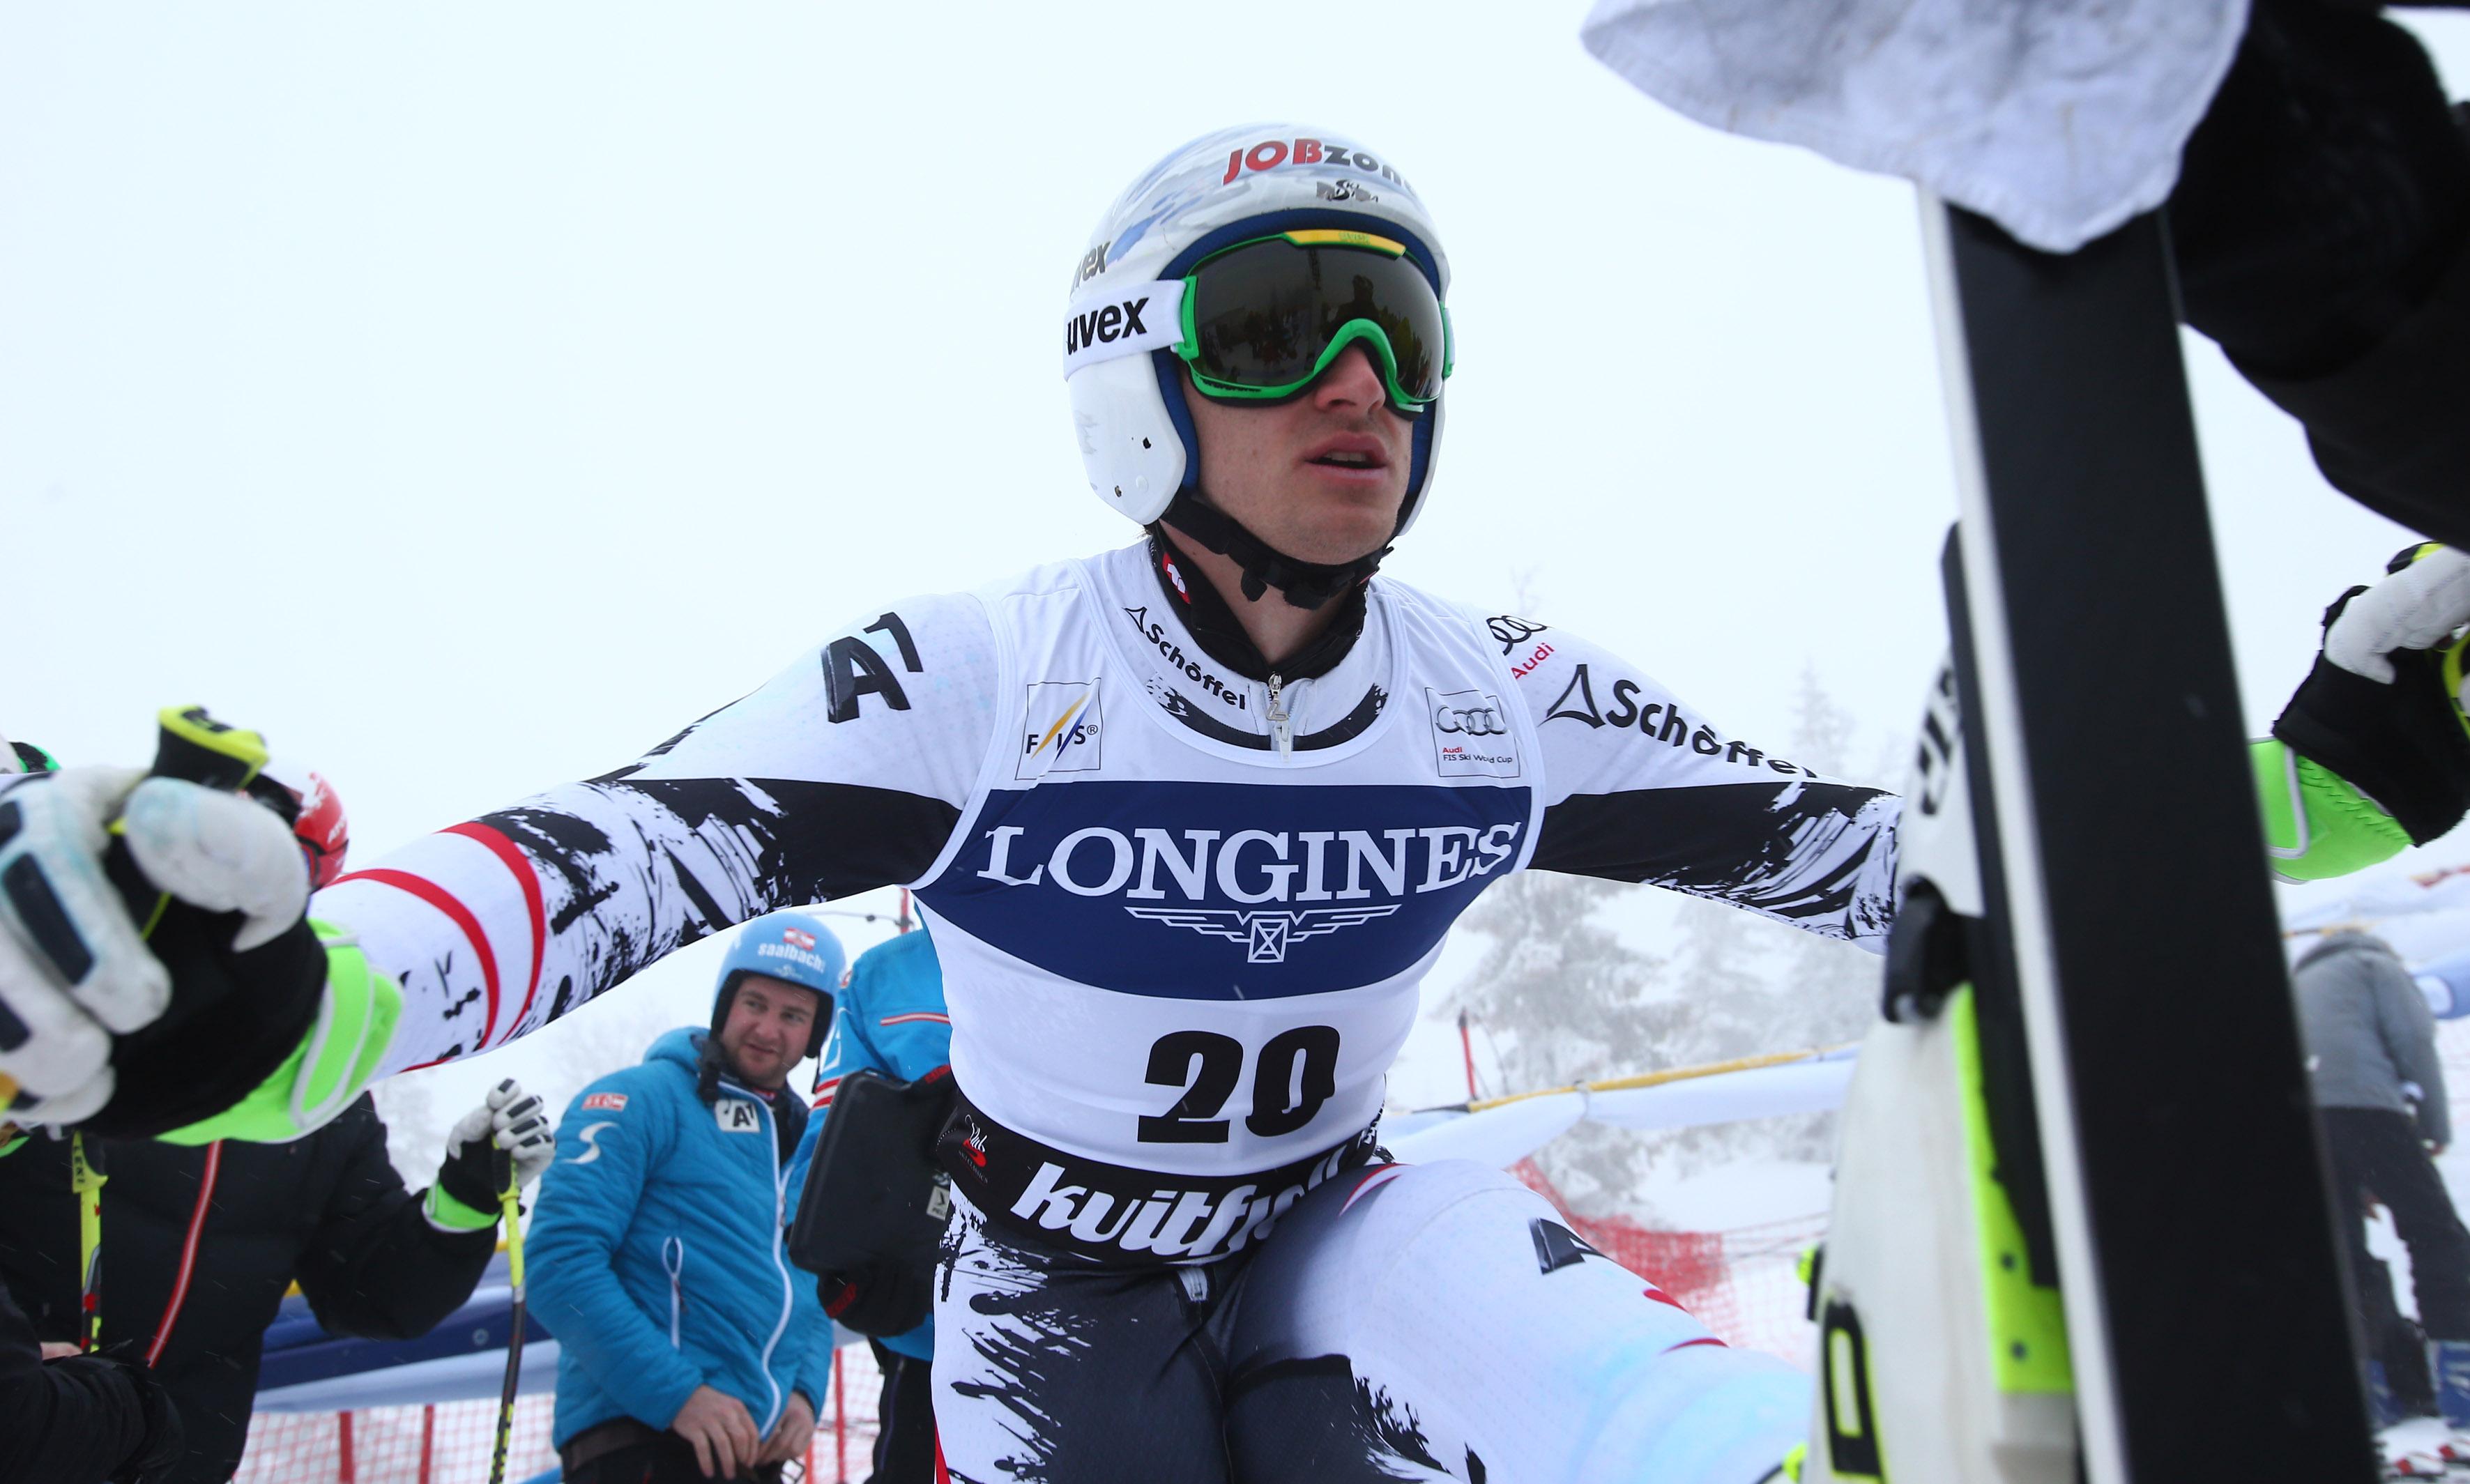 Downhill's  olympic champion Austria's Matthias Mayer  prepares before the start  an alpine ski, men's World Cup downhill training, in Kviitfjell, Norway, Friday, Feb. 28 , 2014